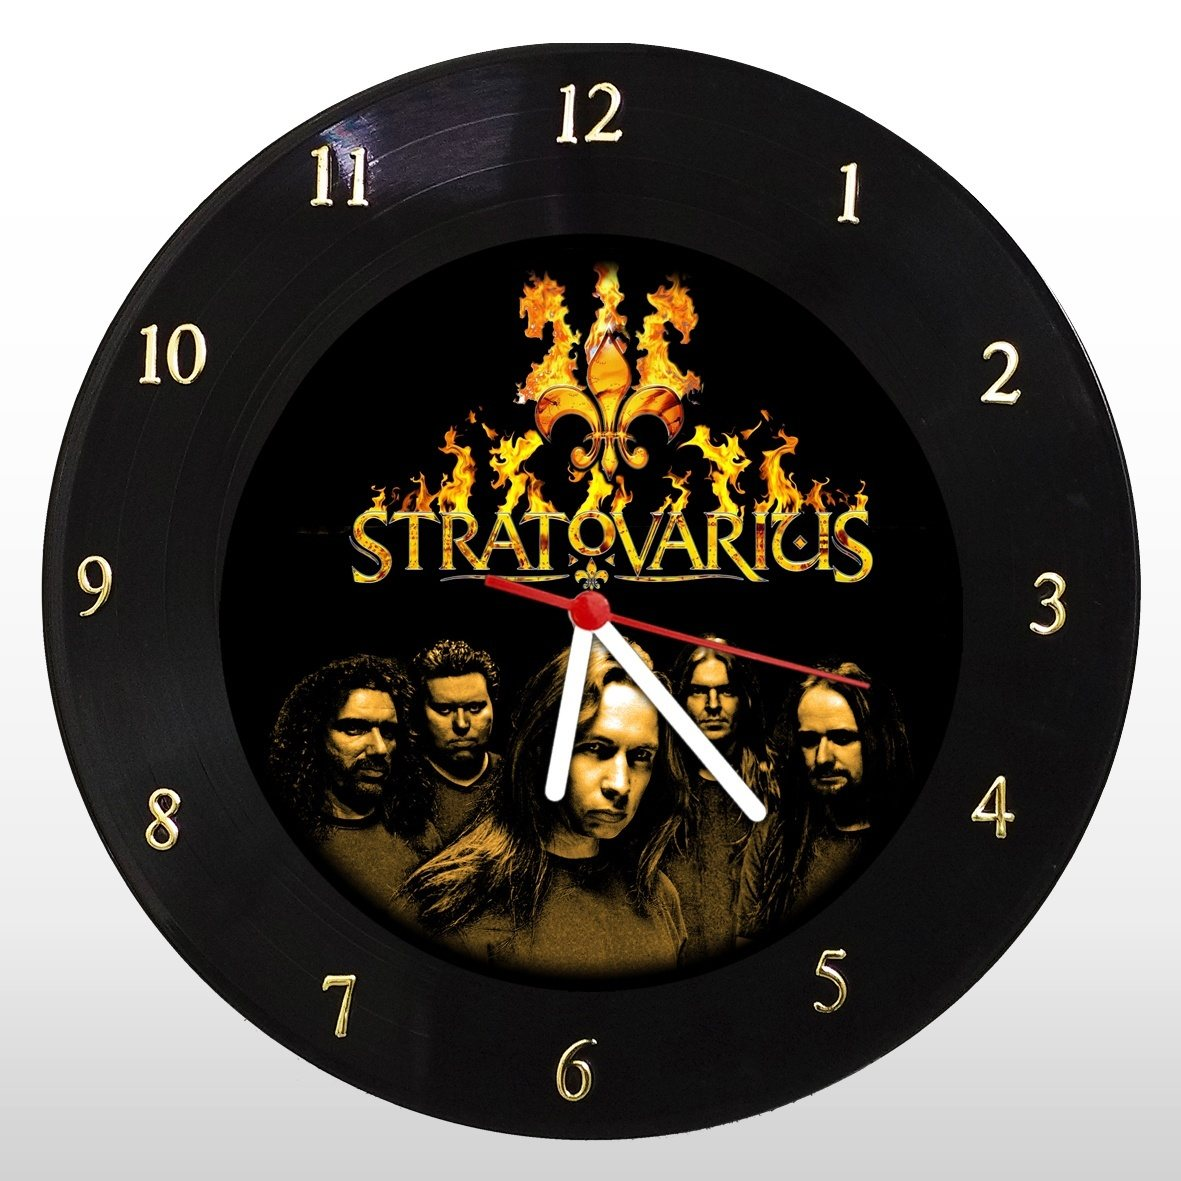 Stratovarius - Relógio de Parede em Disco de Vinil - Mr. Rock